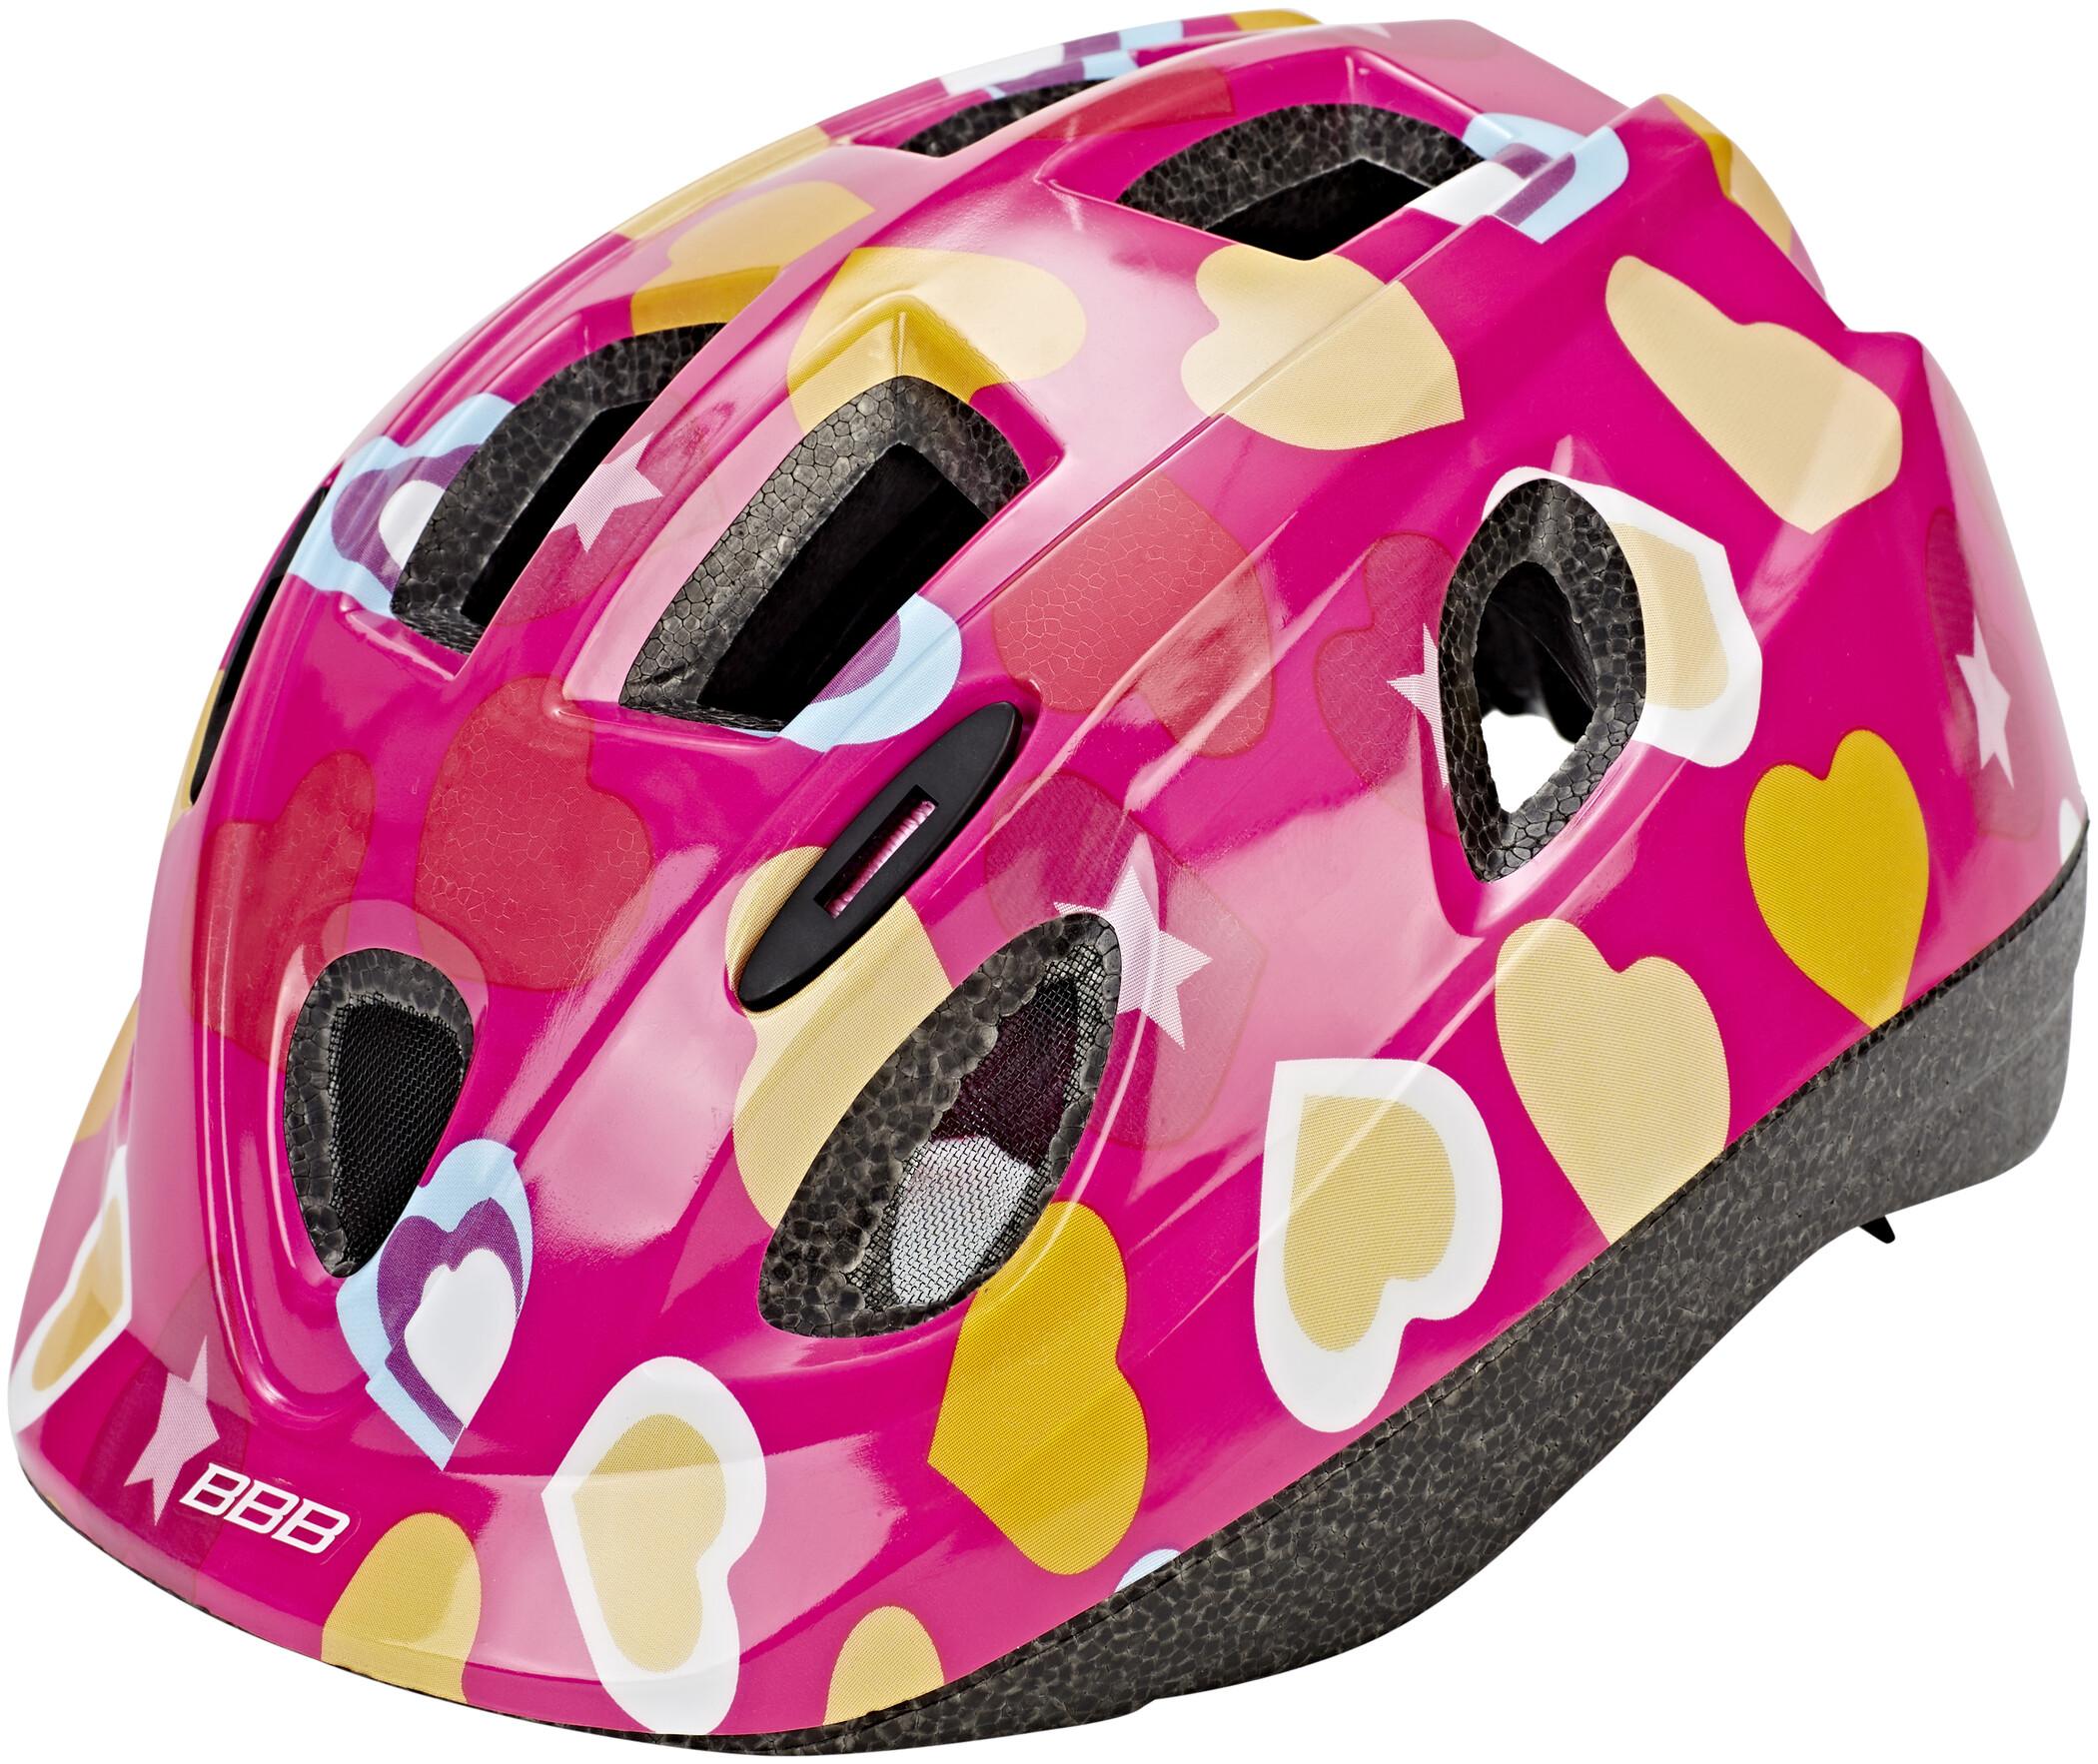 BBB Boogy BHE-37 Cykelhjelm Børn, police (2020)   Helmets